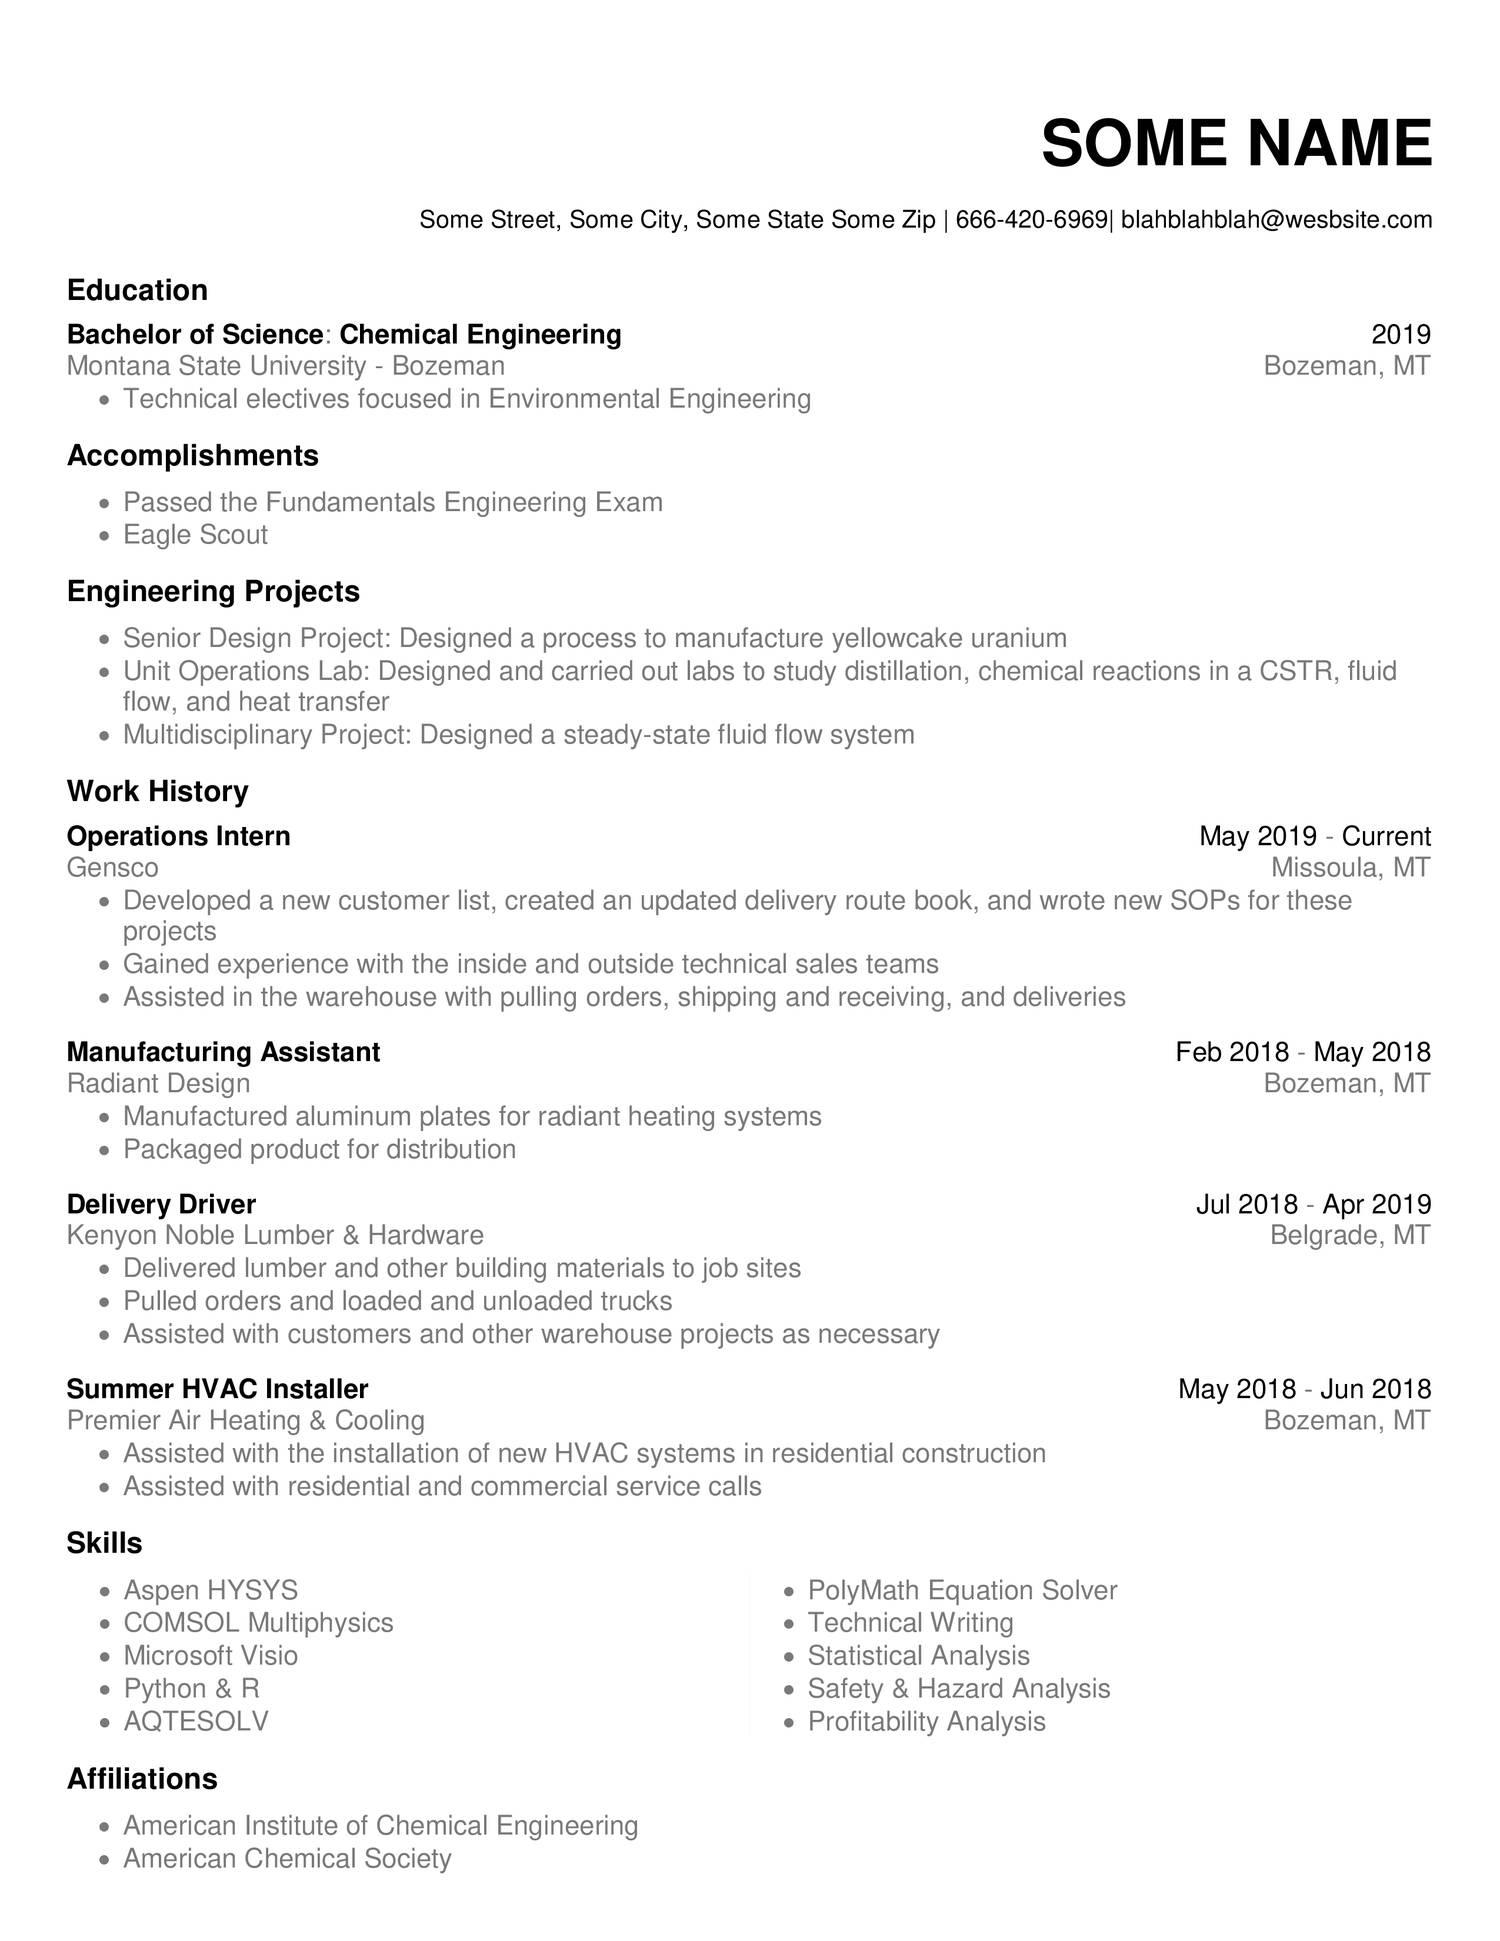 Blank Resume.pdf | DocDroid